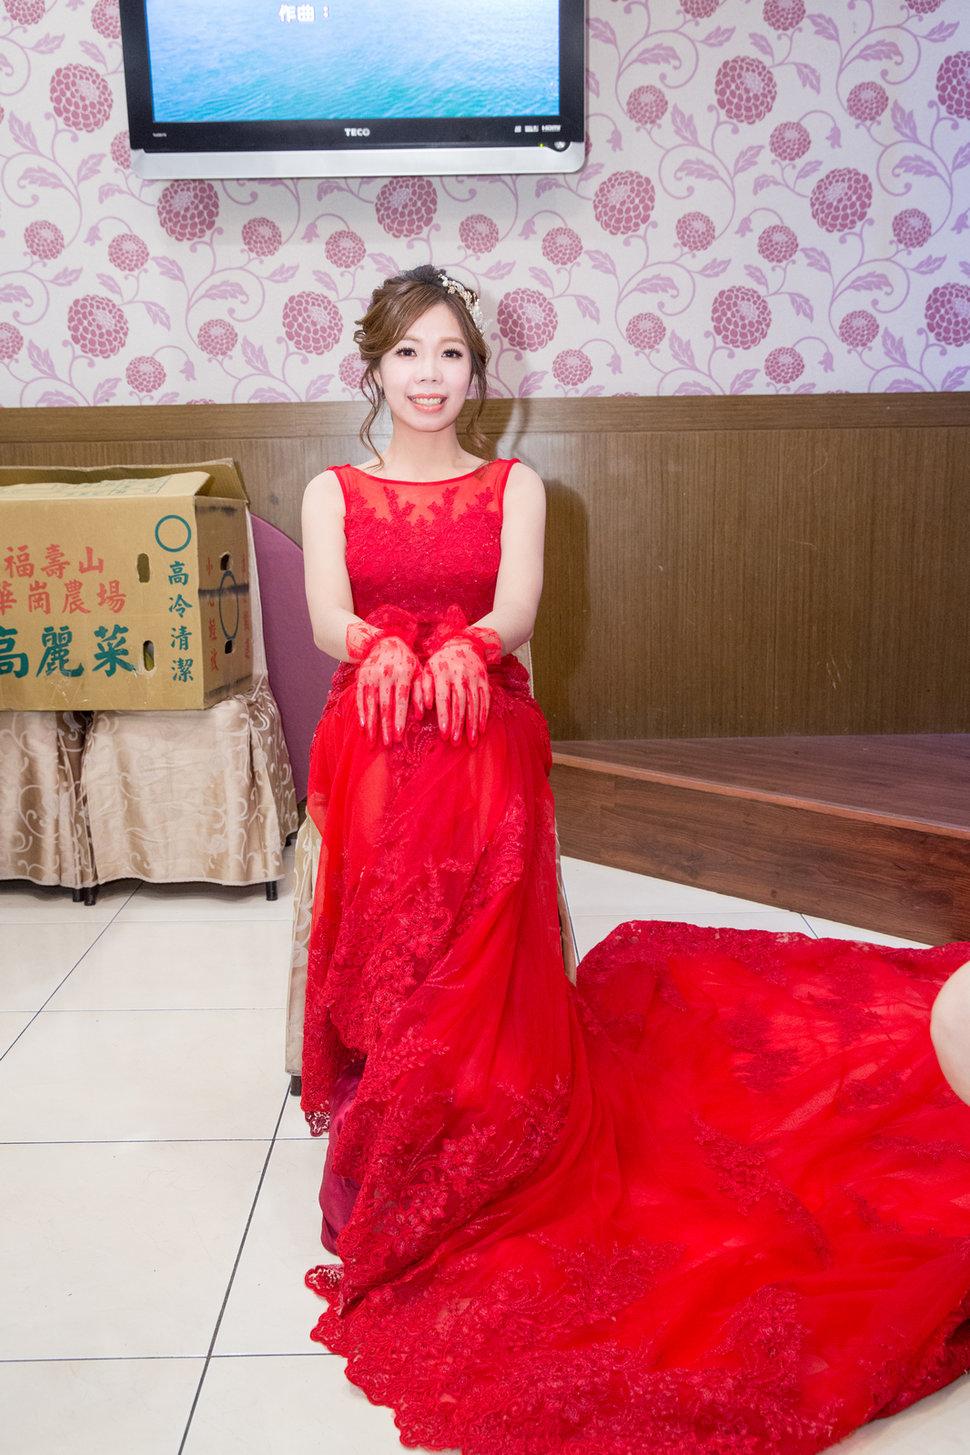 HANK9528 - 蛋拔婚禮紀錄 - 結婚吧